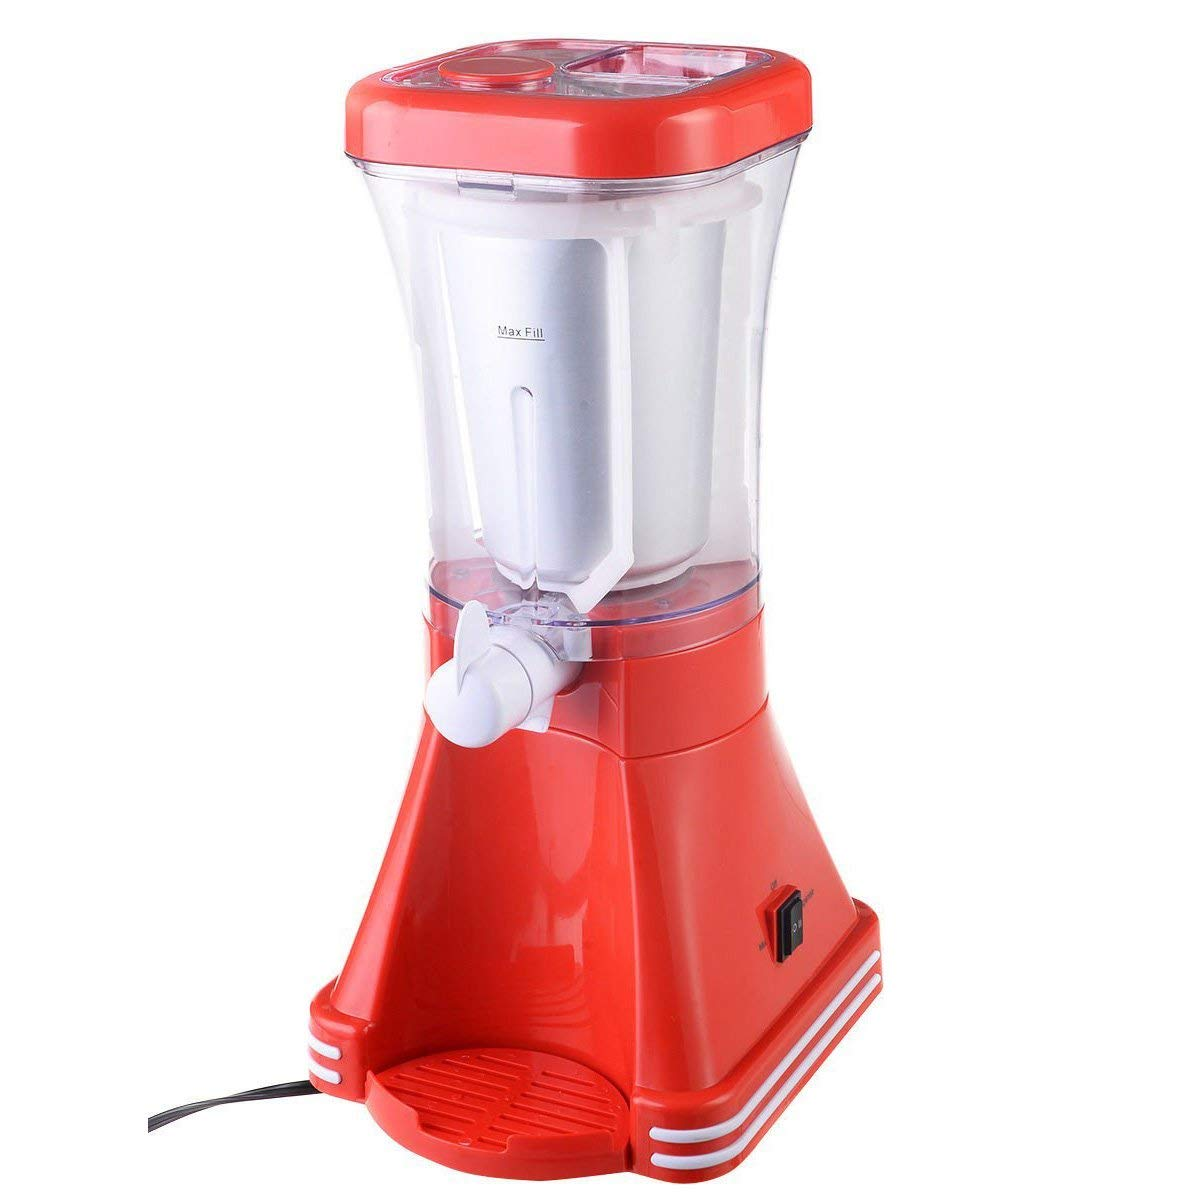 Giantex Slush Drink Maker Retro Machine Blender Ice Slushie Margarita Slurpee Frozen